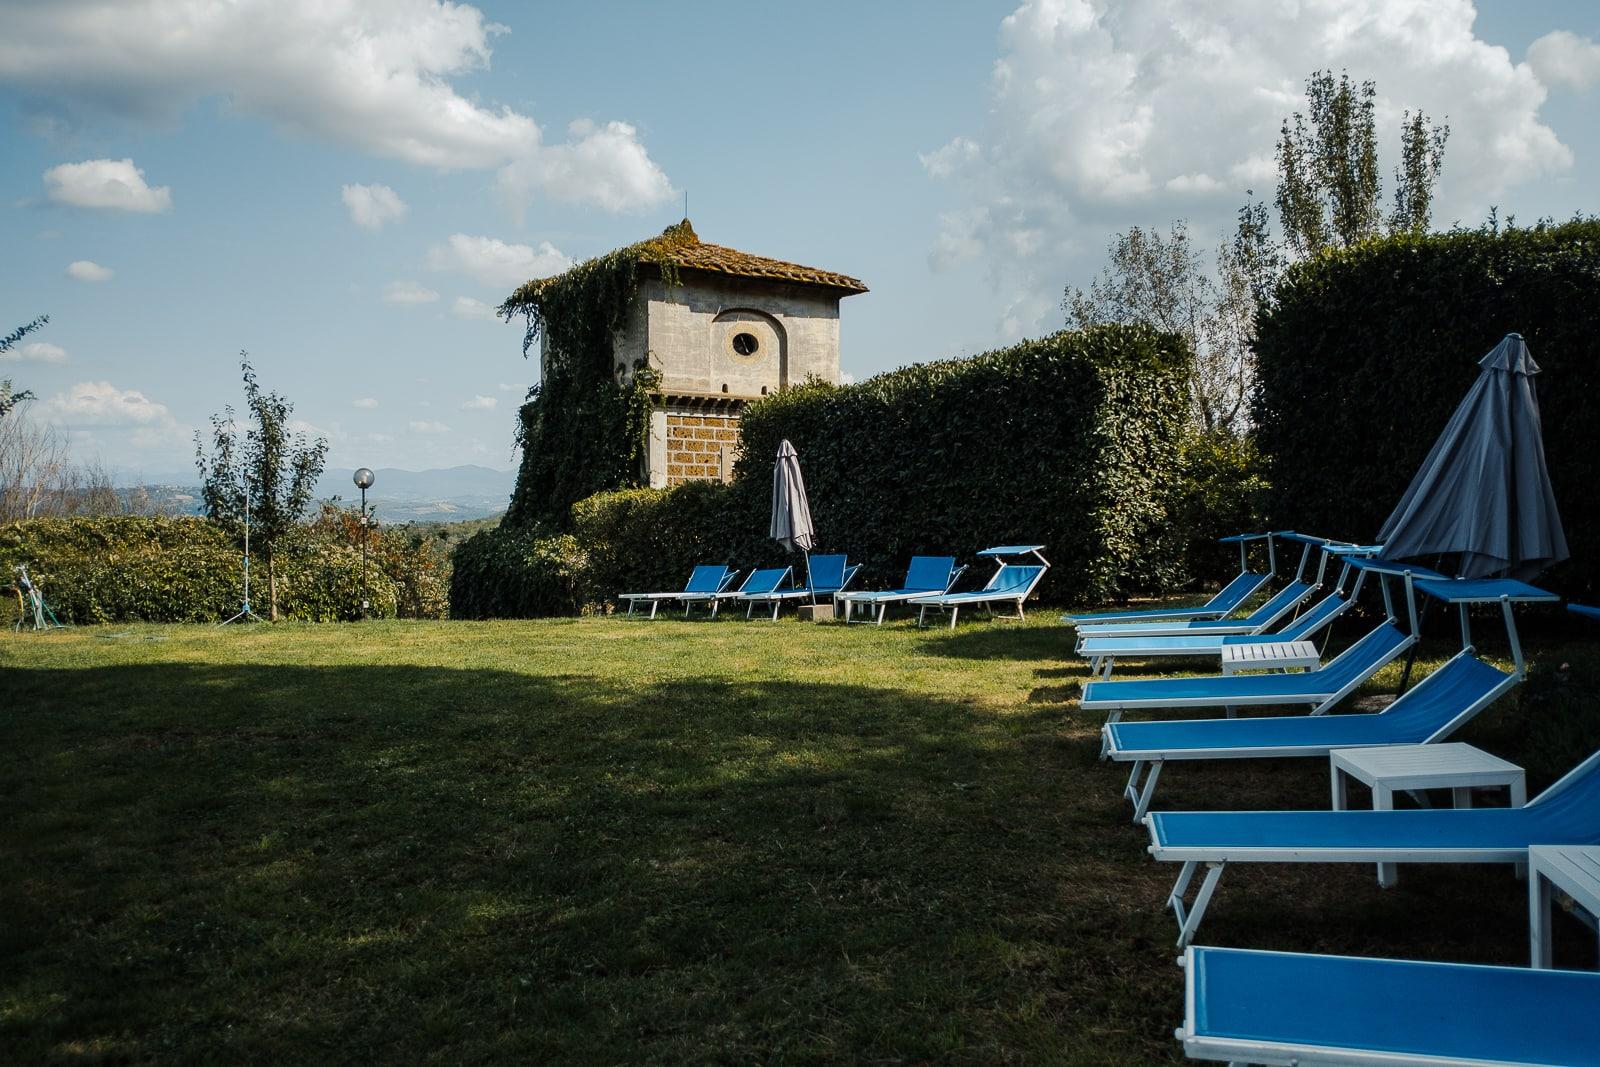 matrimonio_bomarzo_il giardino e la dimora_paesaggio